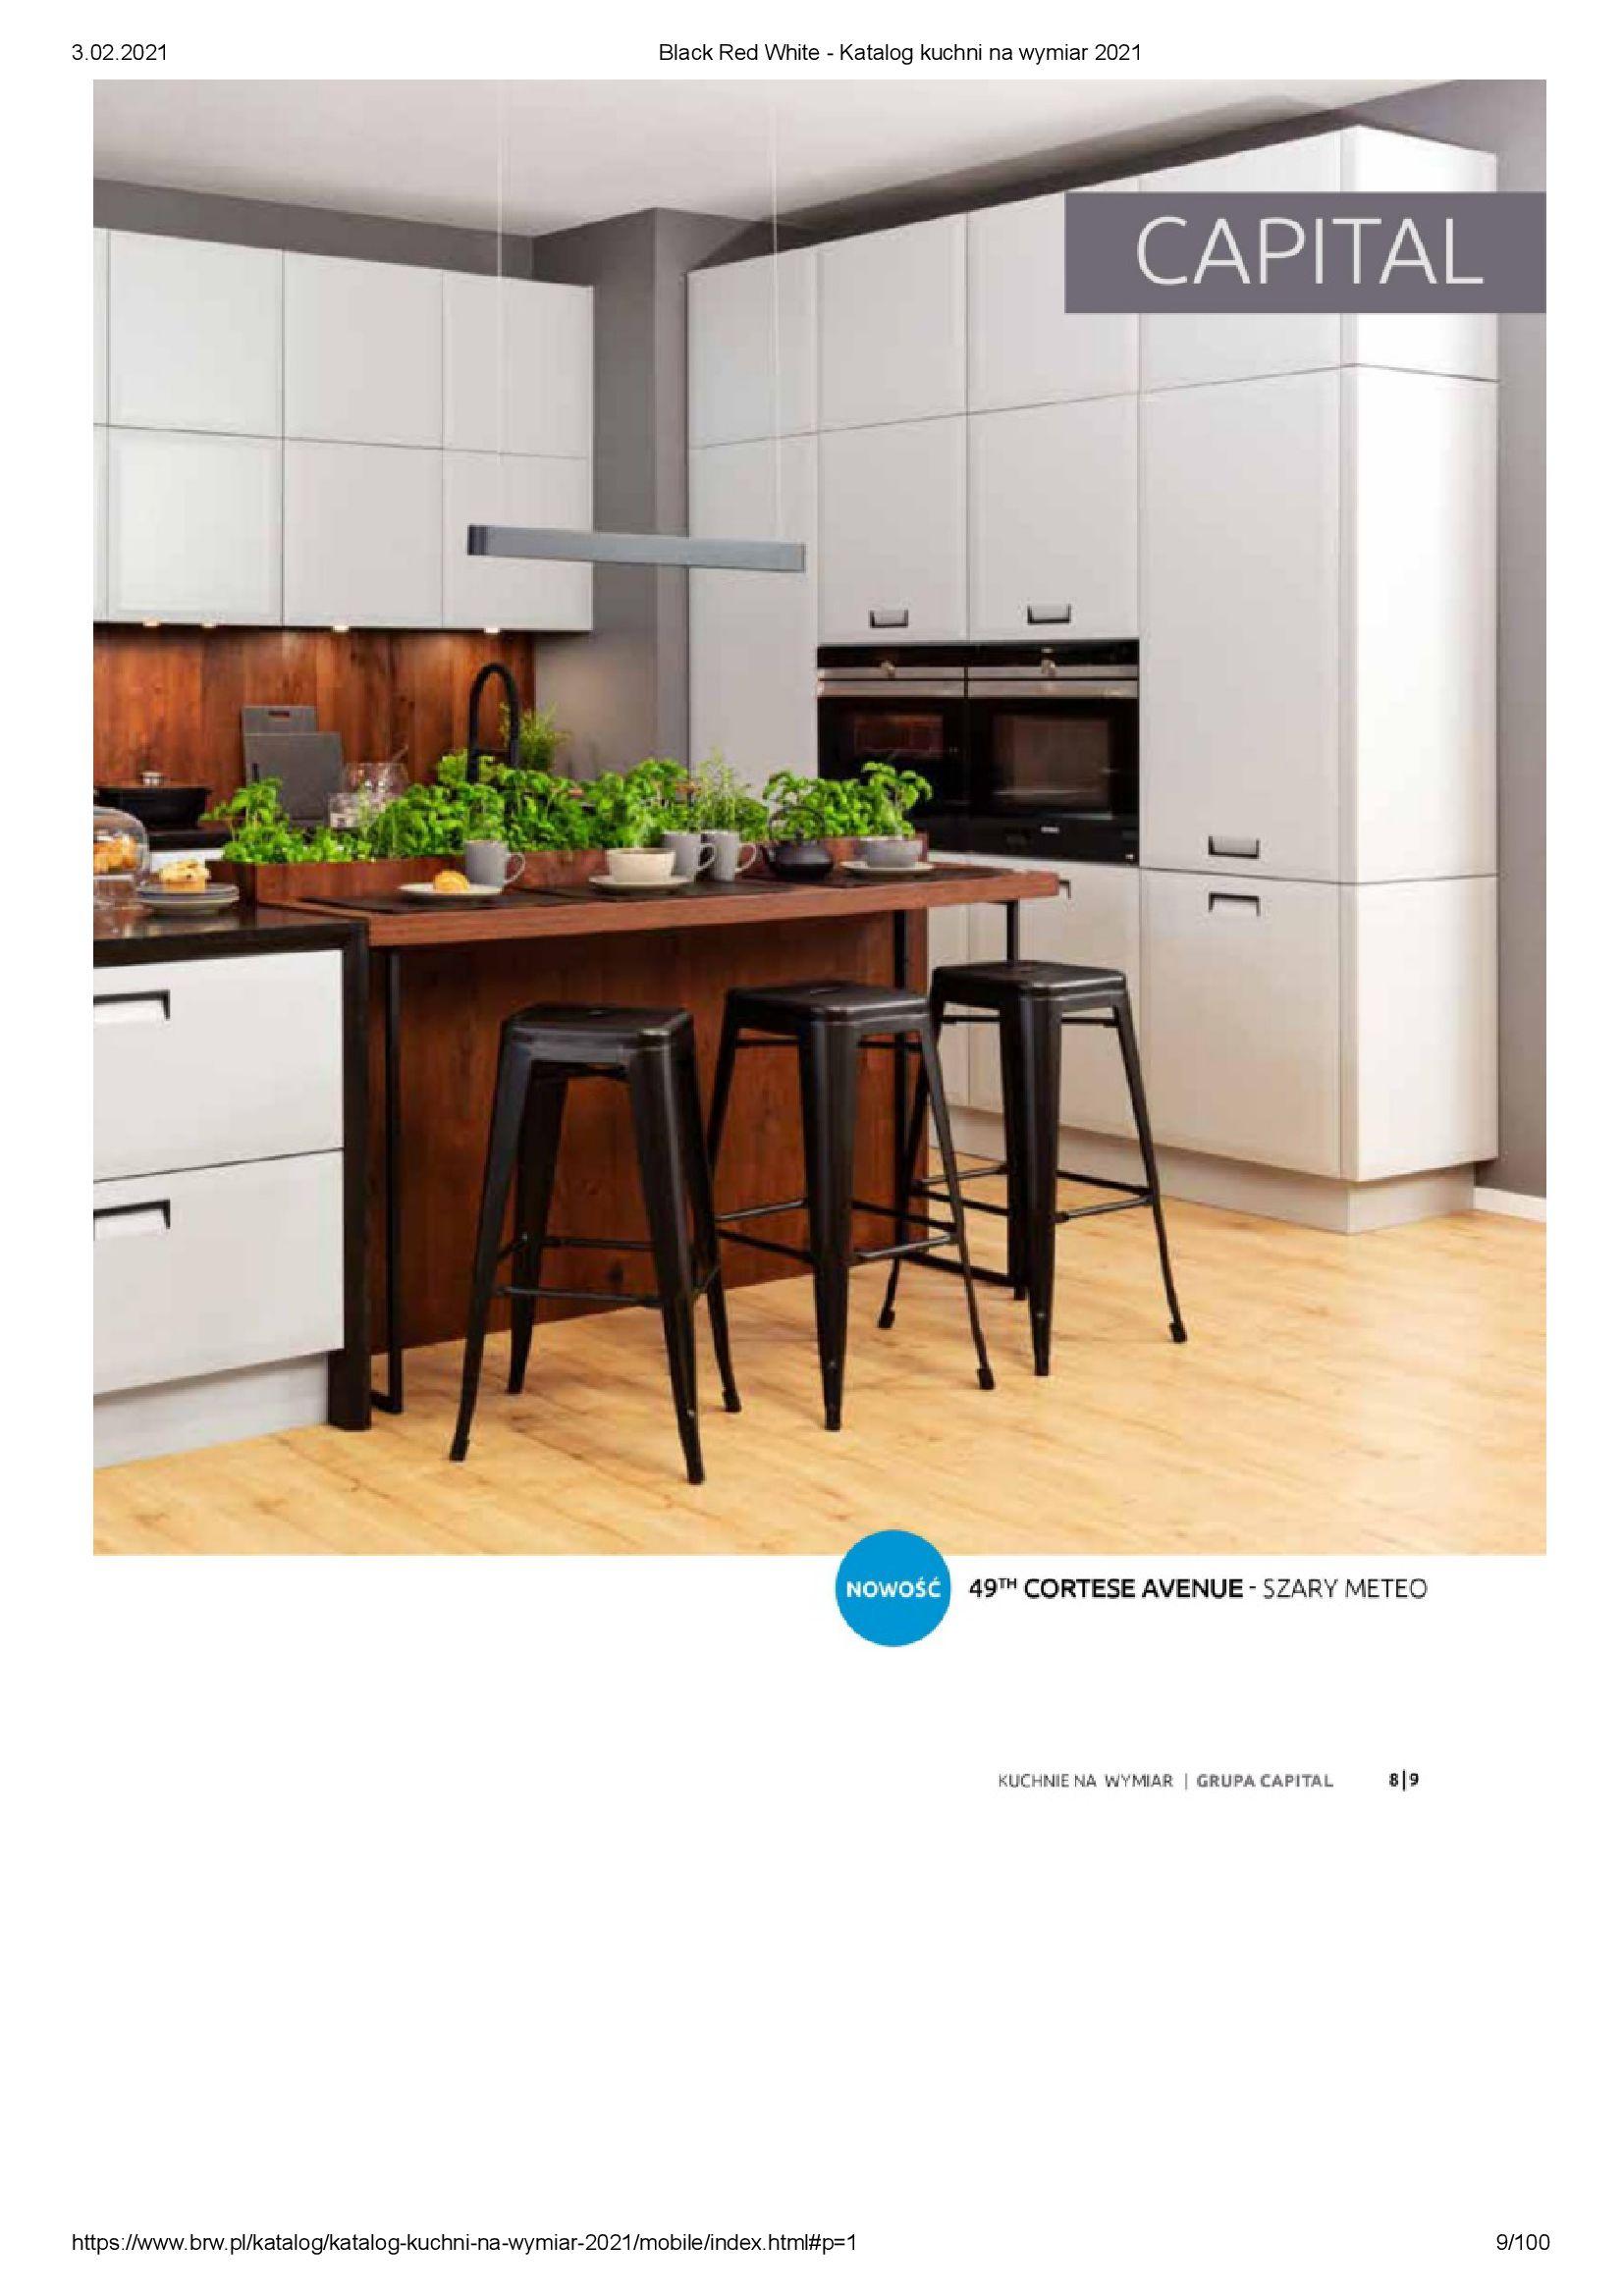 Gazetka Black Red White: Katalog - Kuchnie na wymiar Senso Kitchens 2021 2021-01-01 page-9